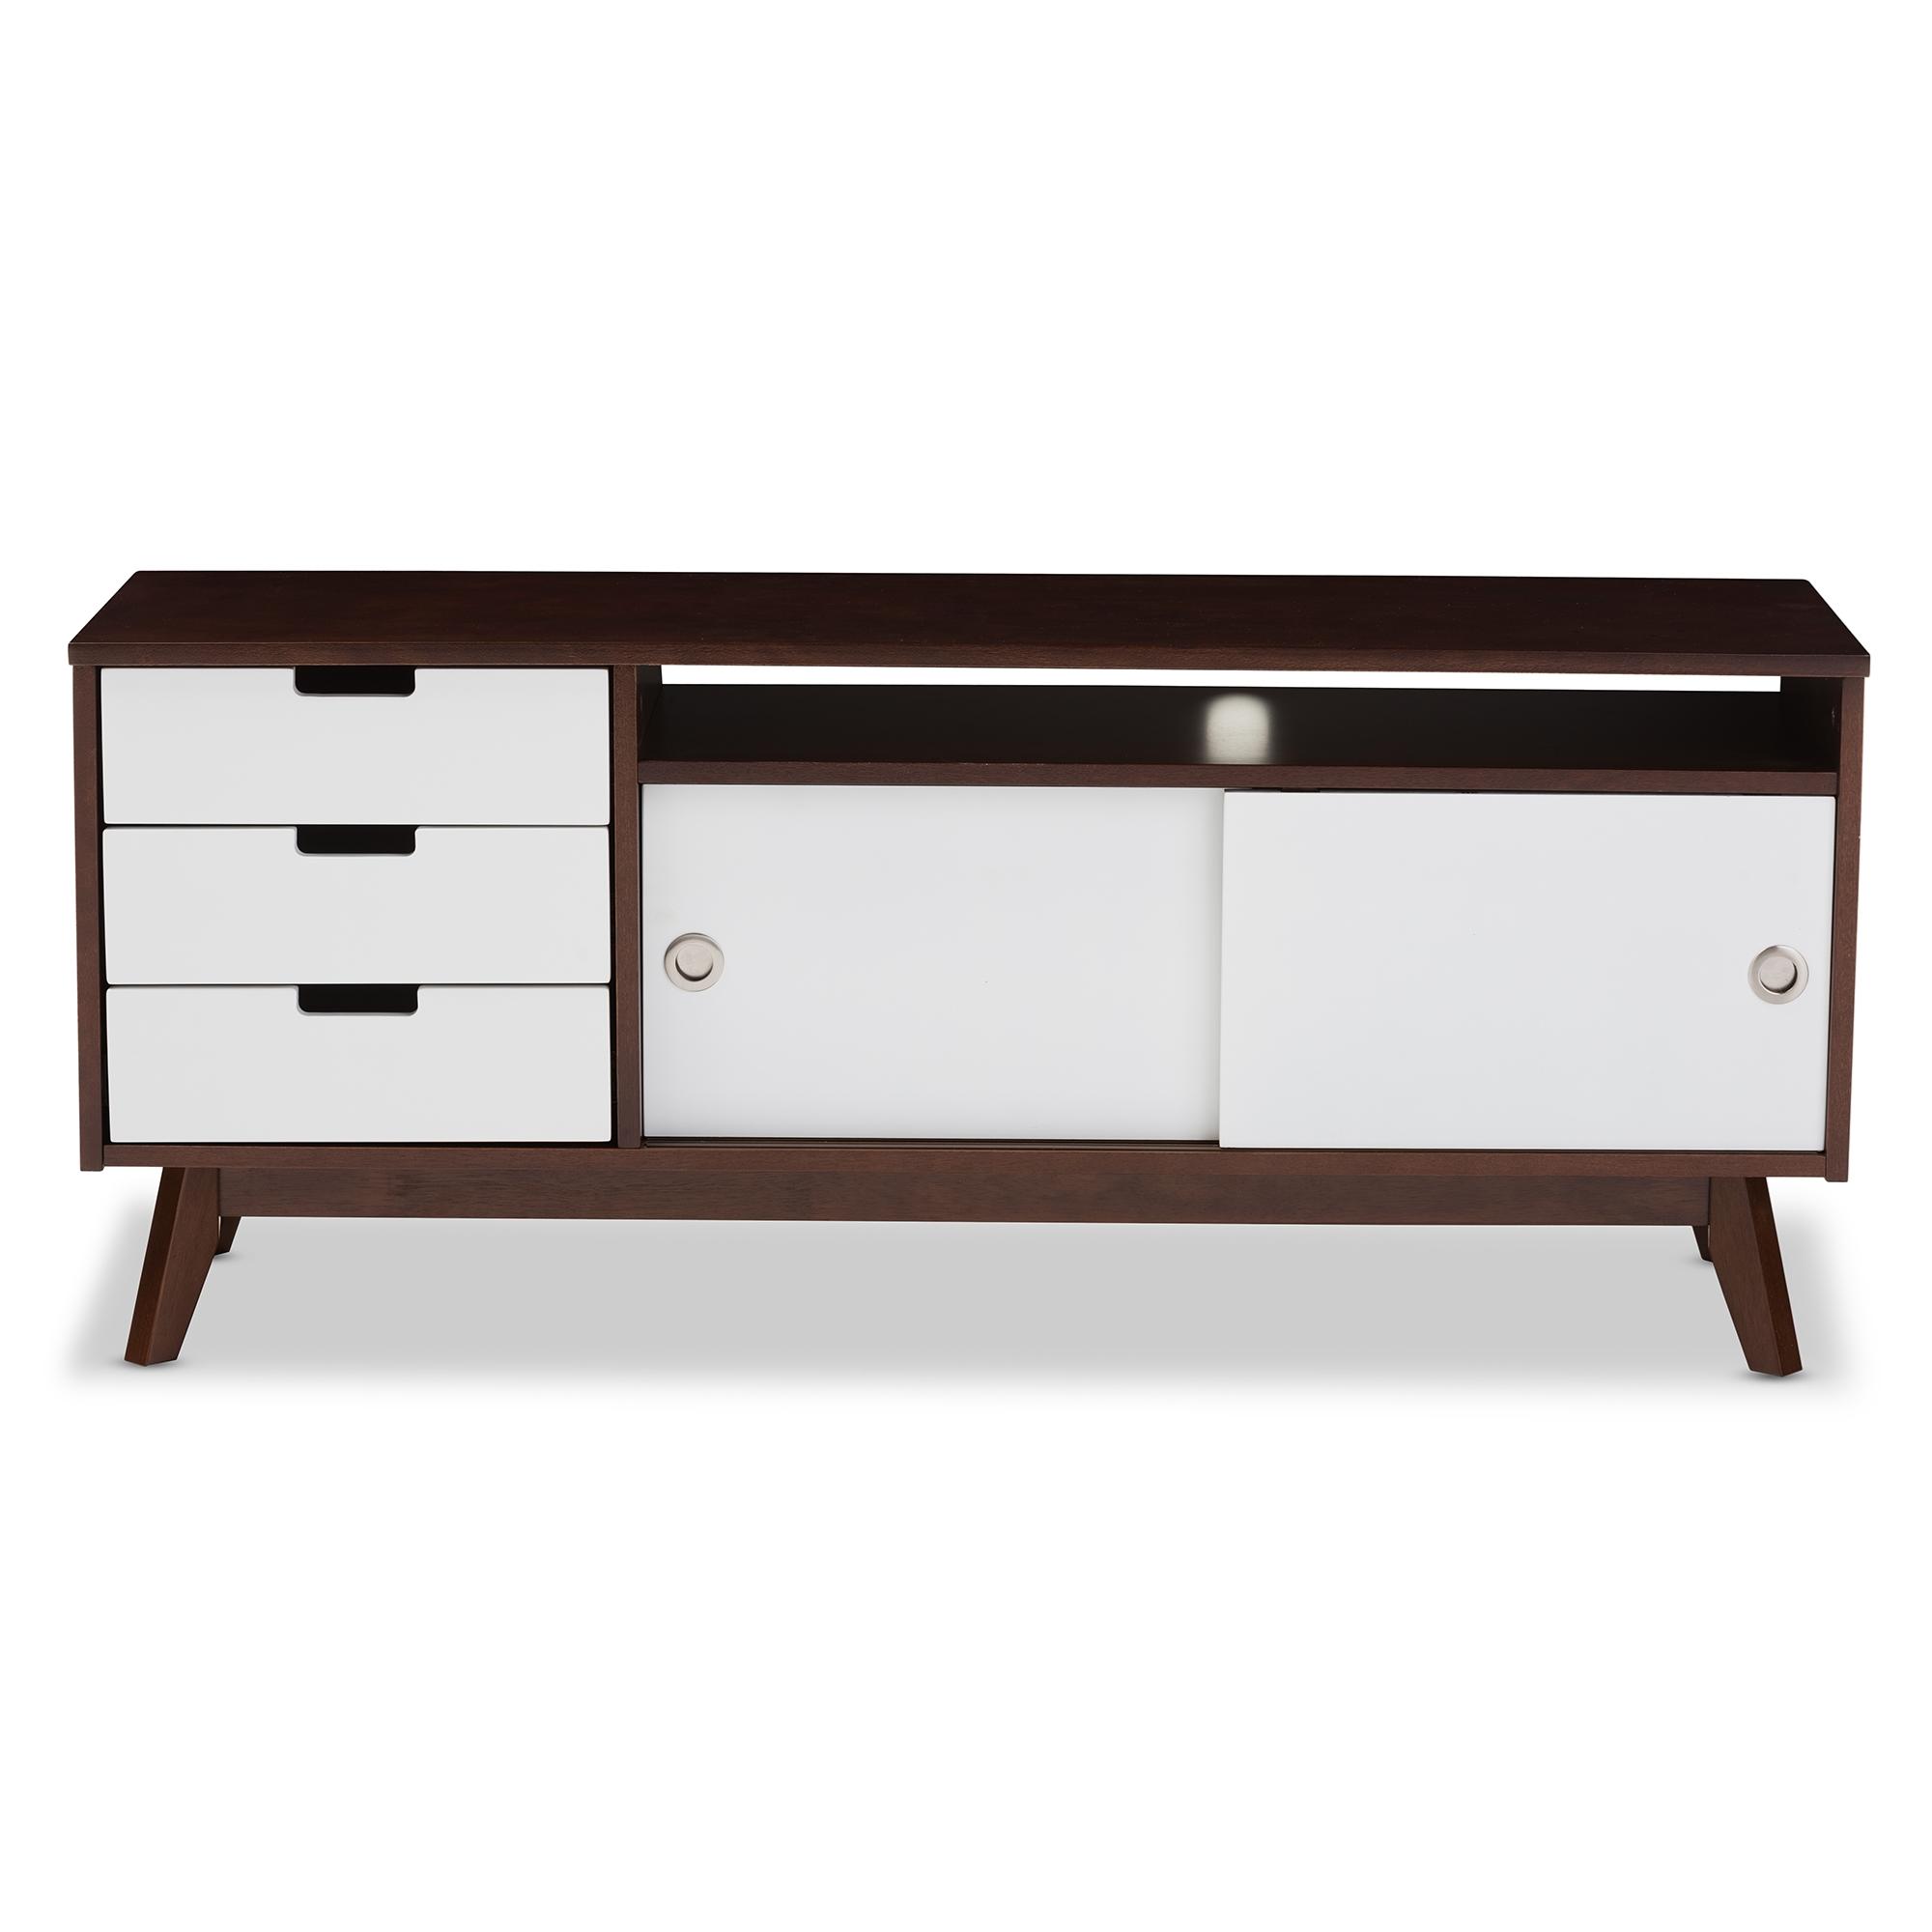 mid century diy n tv furr plans wth cabinet canada fnally modern ikea stand